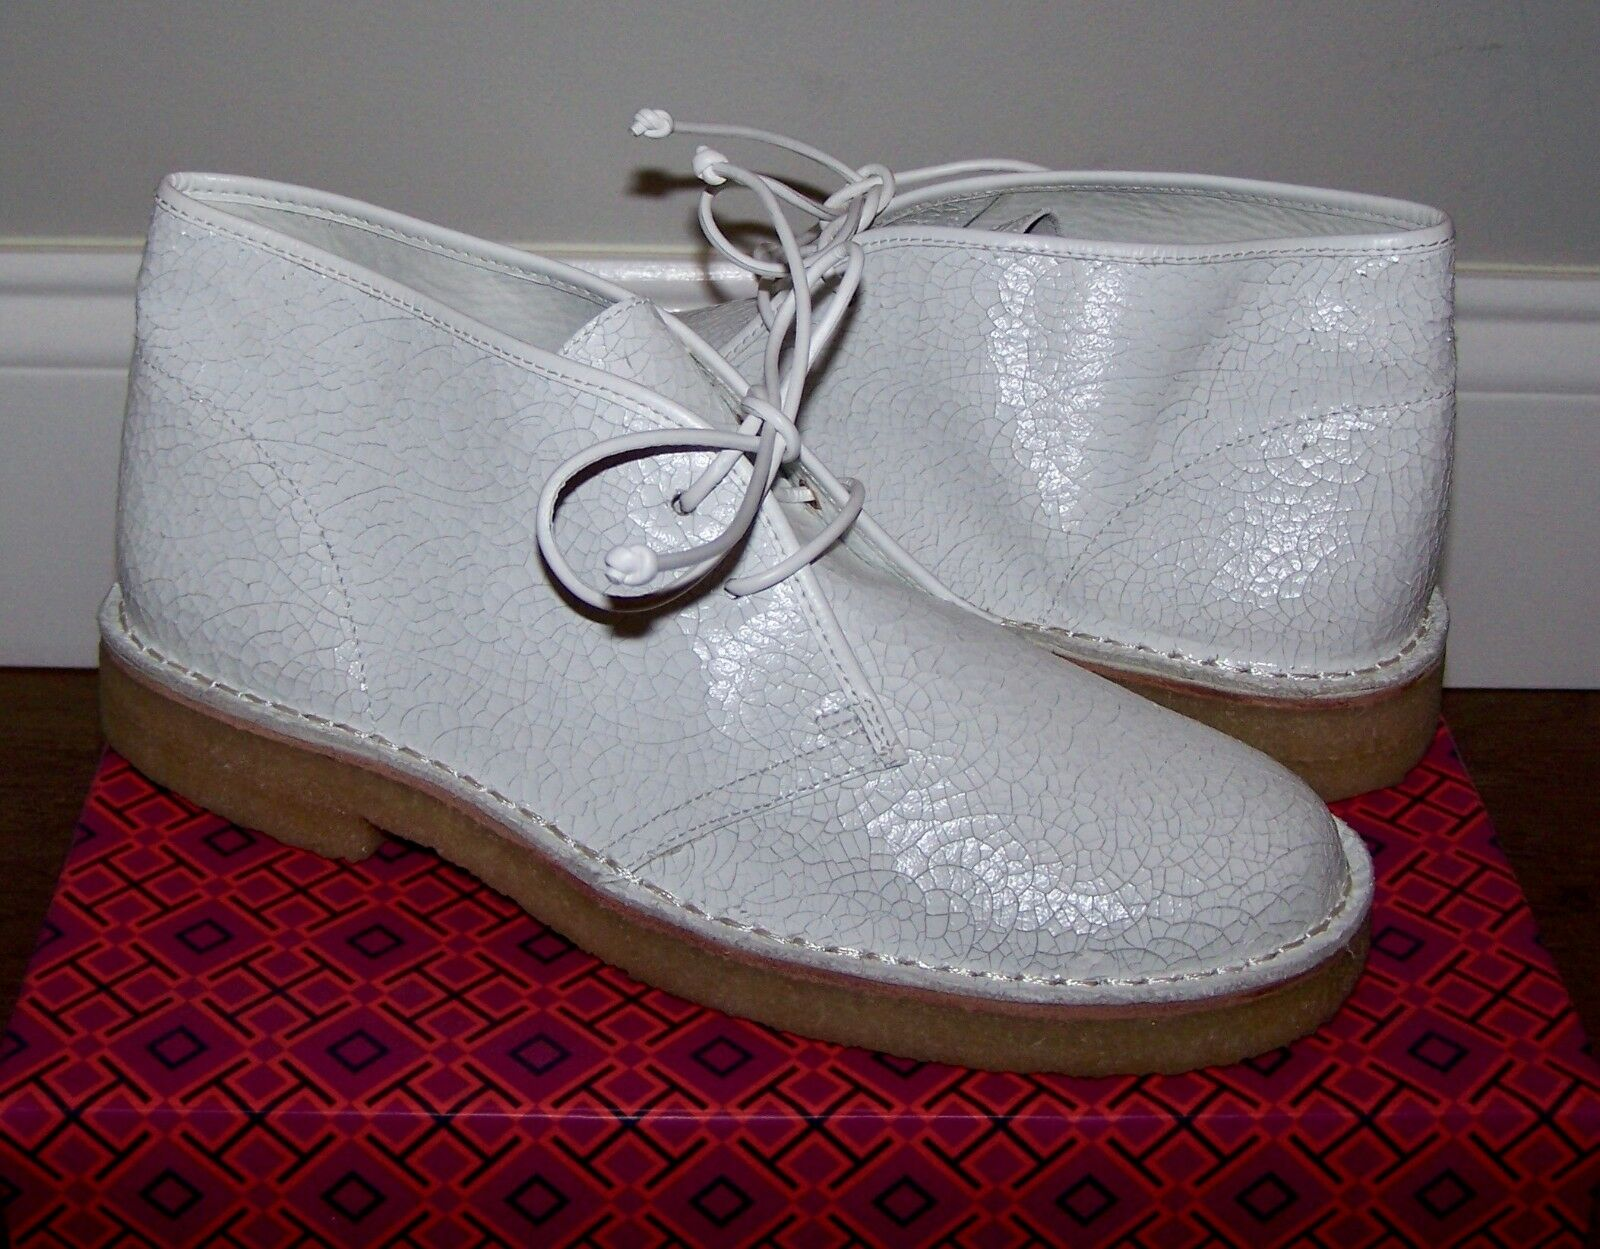 350 NEW femmes TORY BURCH BERGEN CRACKLED LEATHER DESERT CHUCKA bottes chaussures 8.5